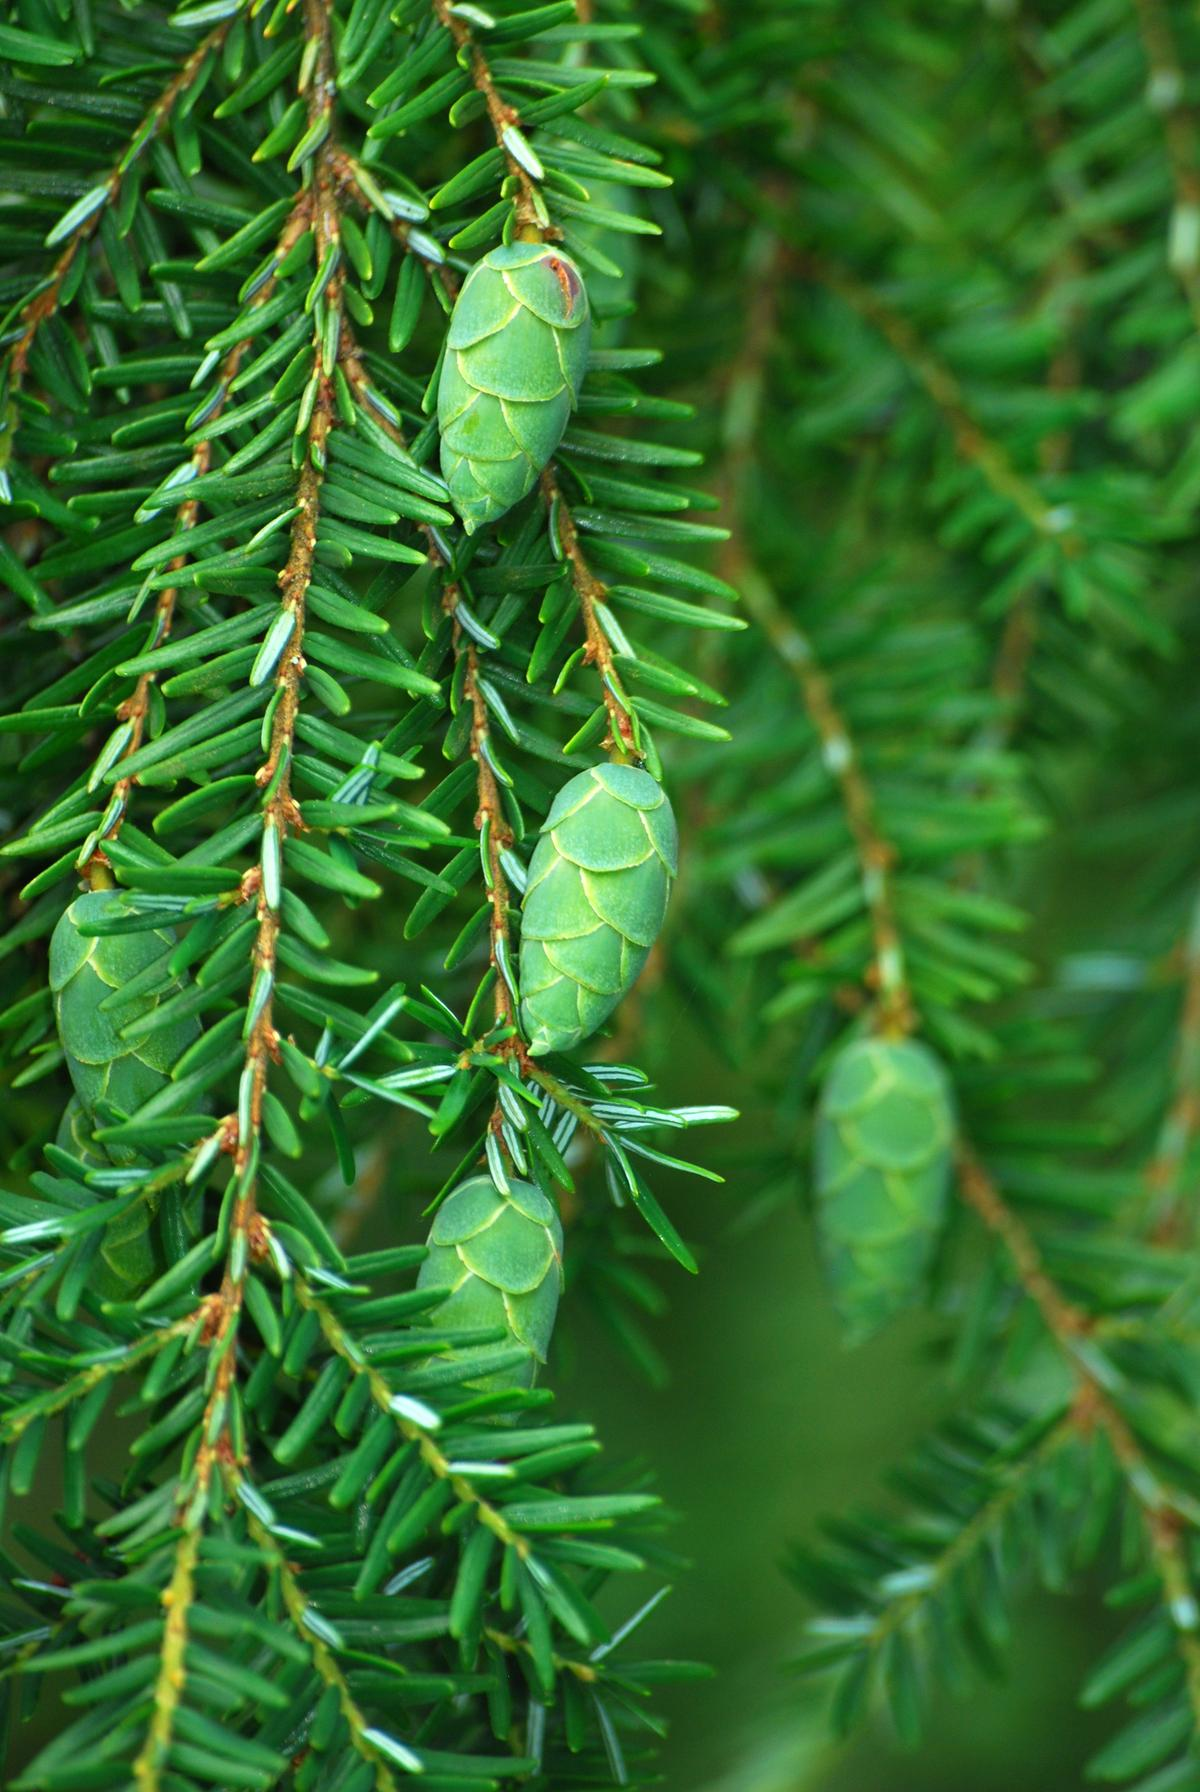 Wirtualny Atlas Roślin Choina Kanadyjska Tsuga Canadensis